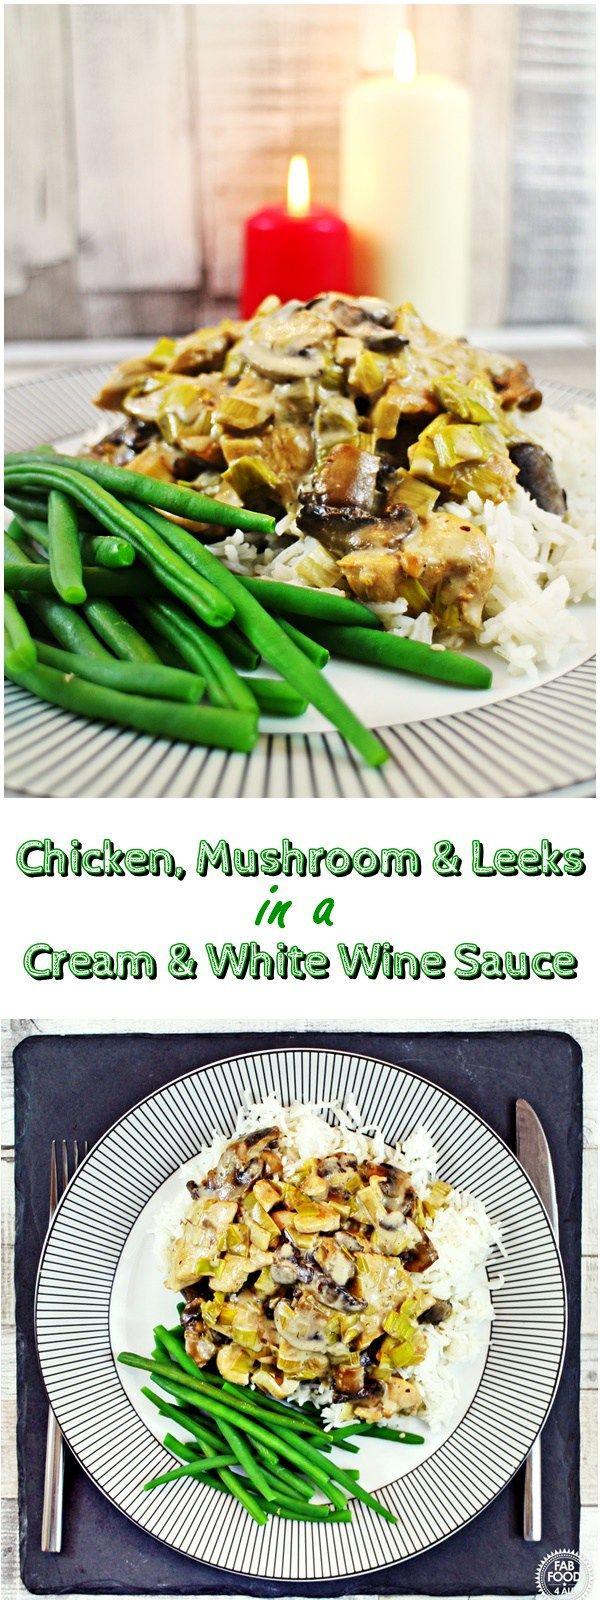 ... Mushroom Recipes on Pinterest | Mushrooms Recipes, Mushroom Soup